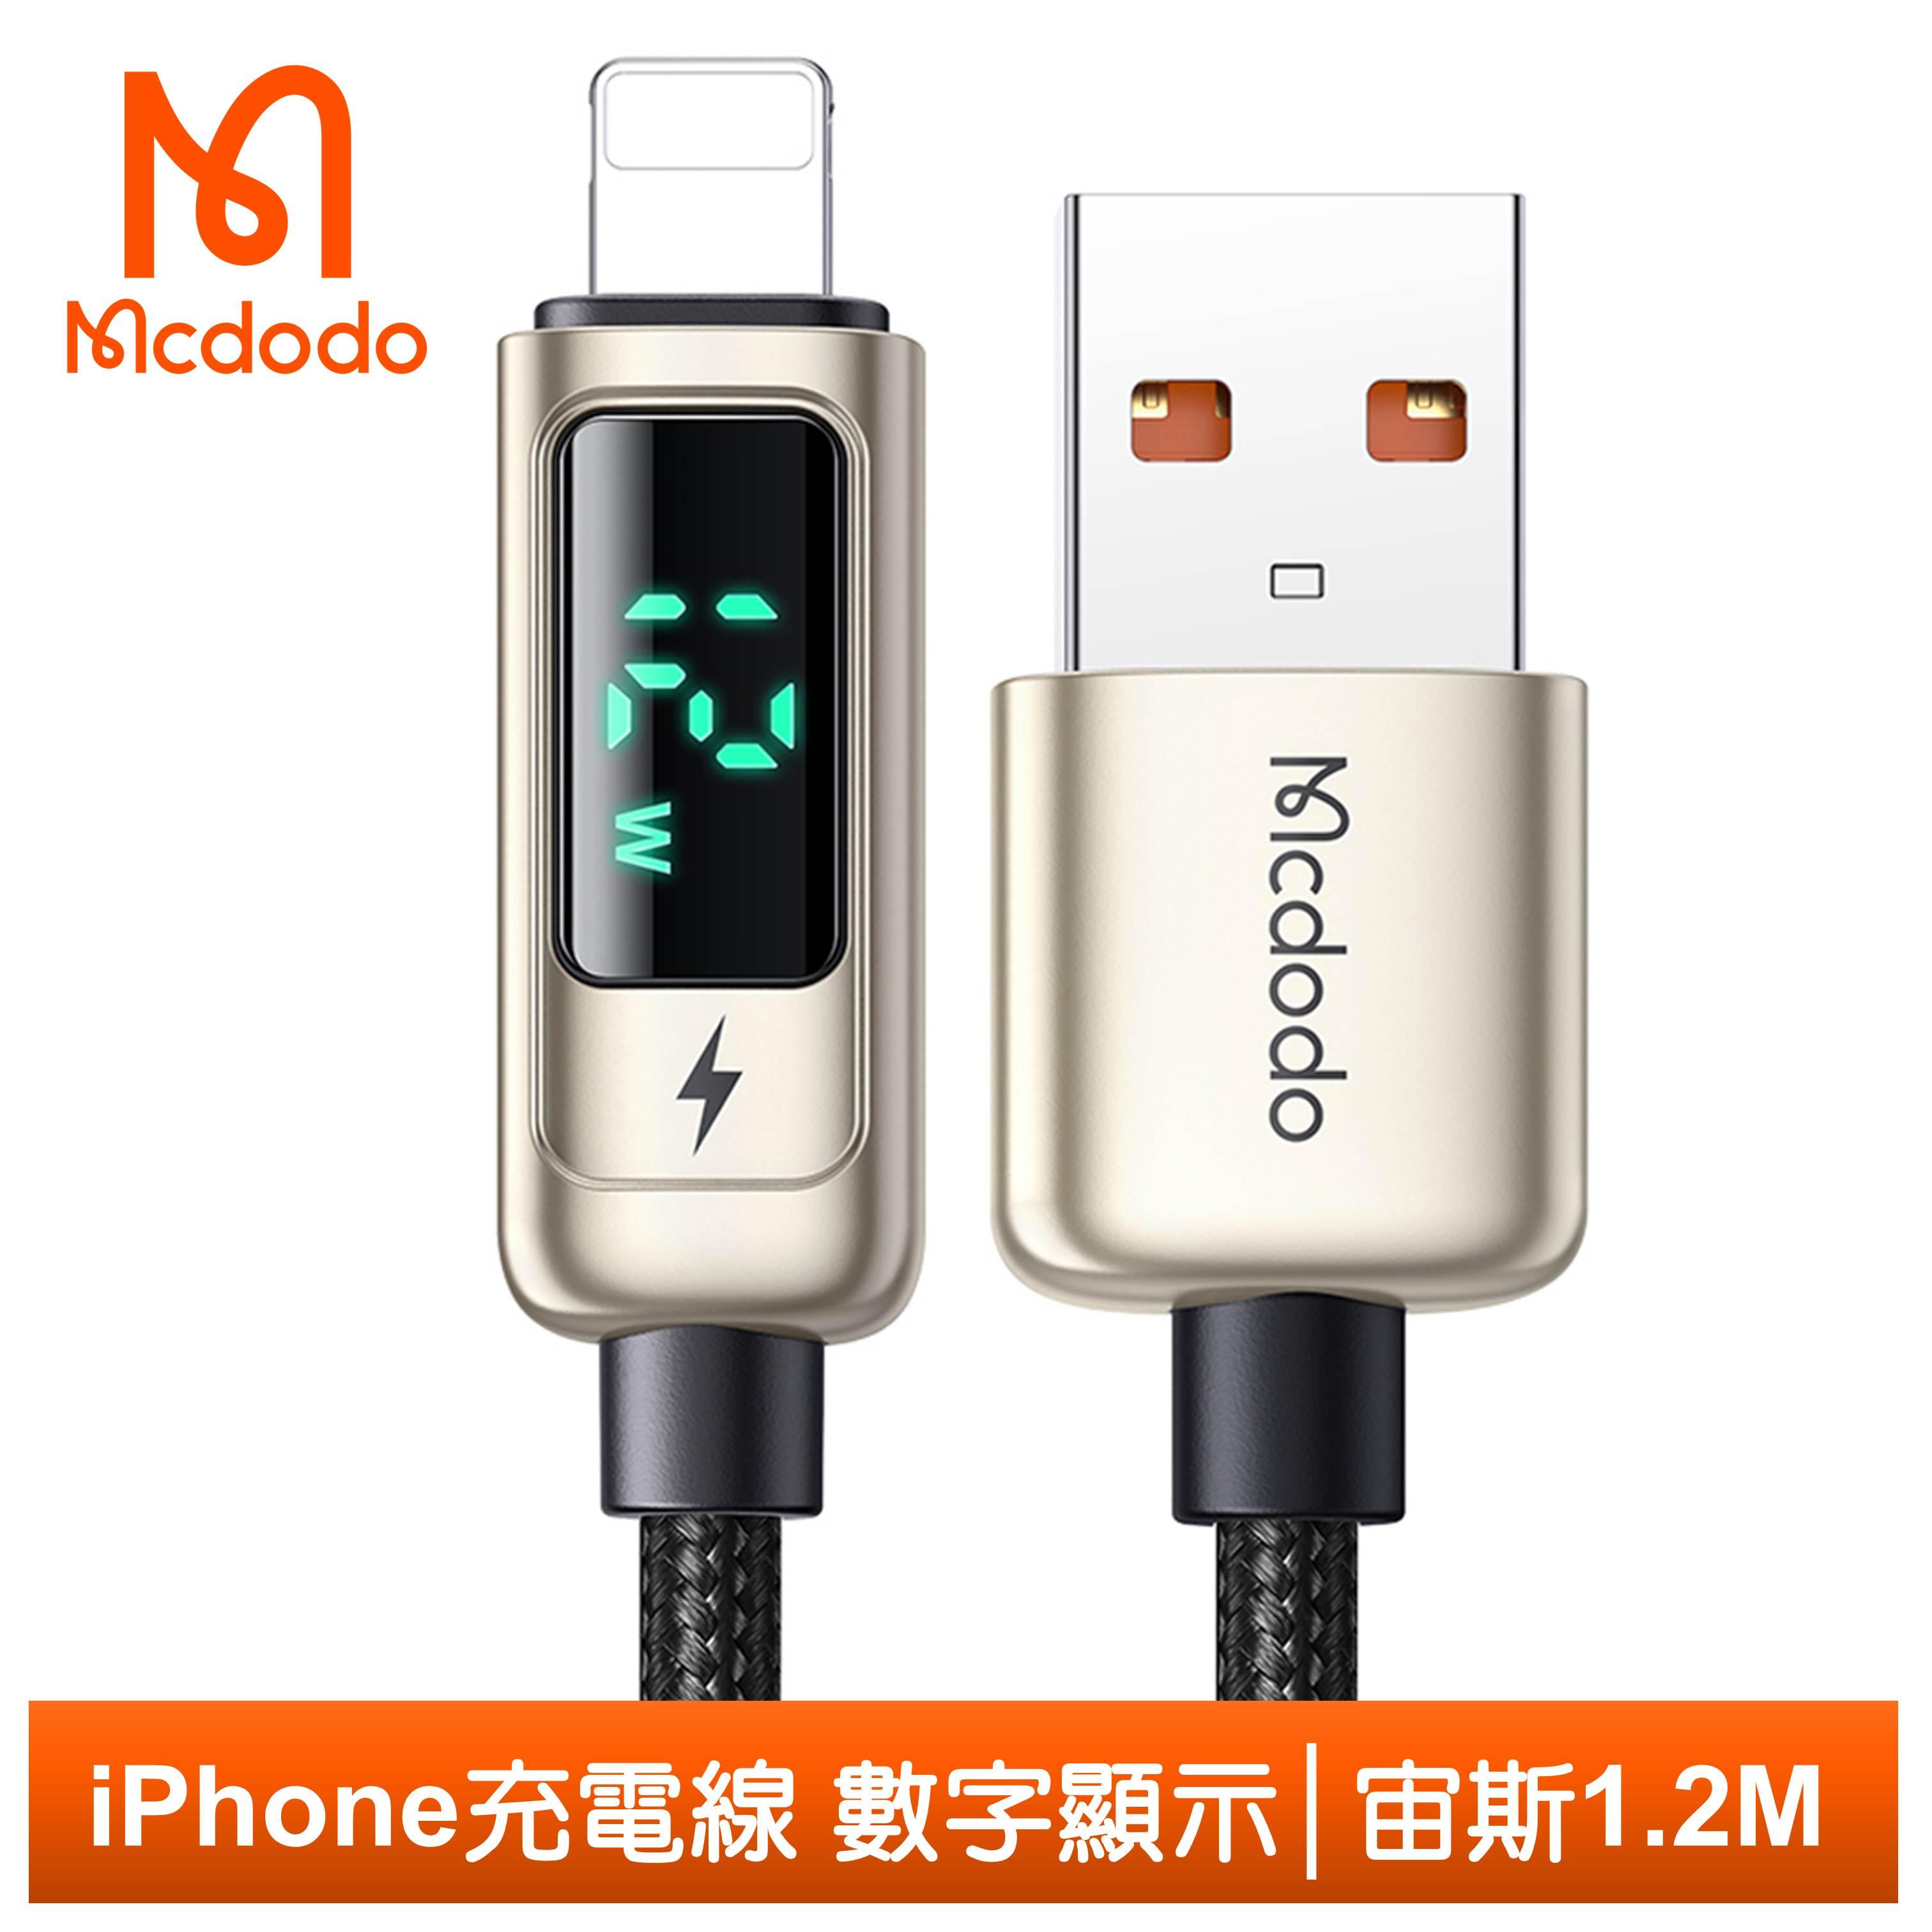 Mcdodo麥多多台灣官方 Lightning/iPhone充電線傳輸線快充線編織 功率數顯 宙斯系列 1.2M 銀色